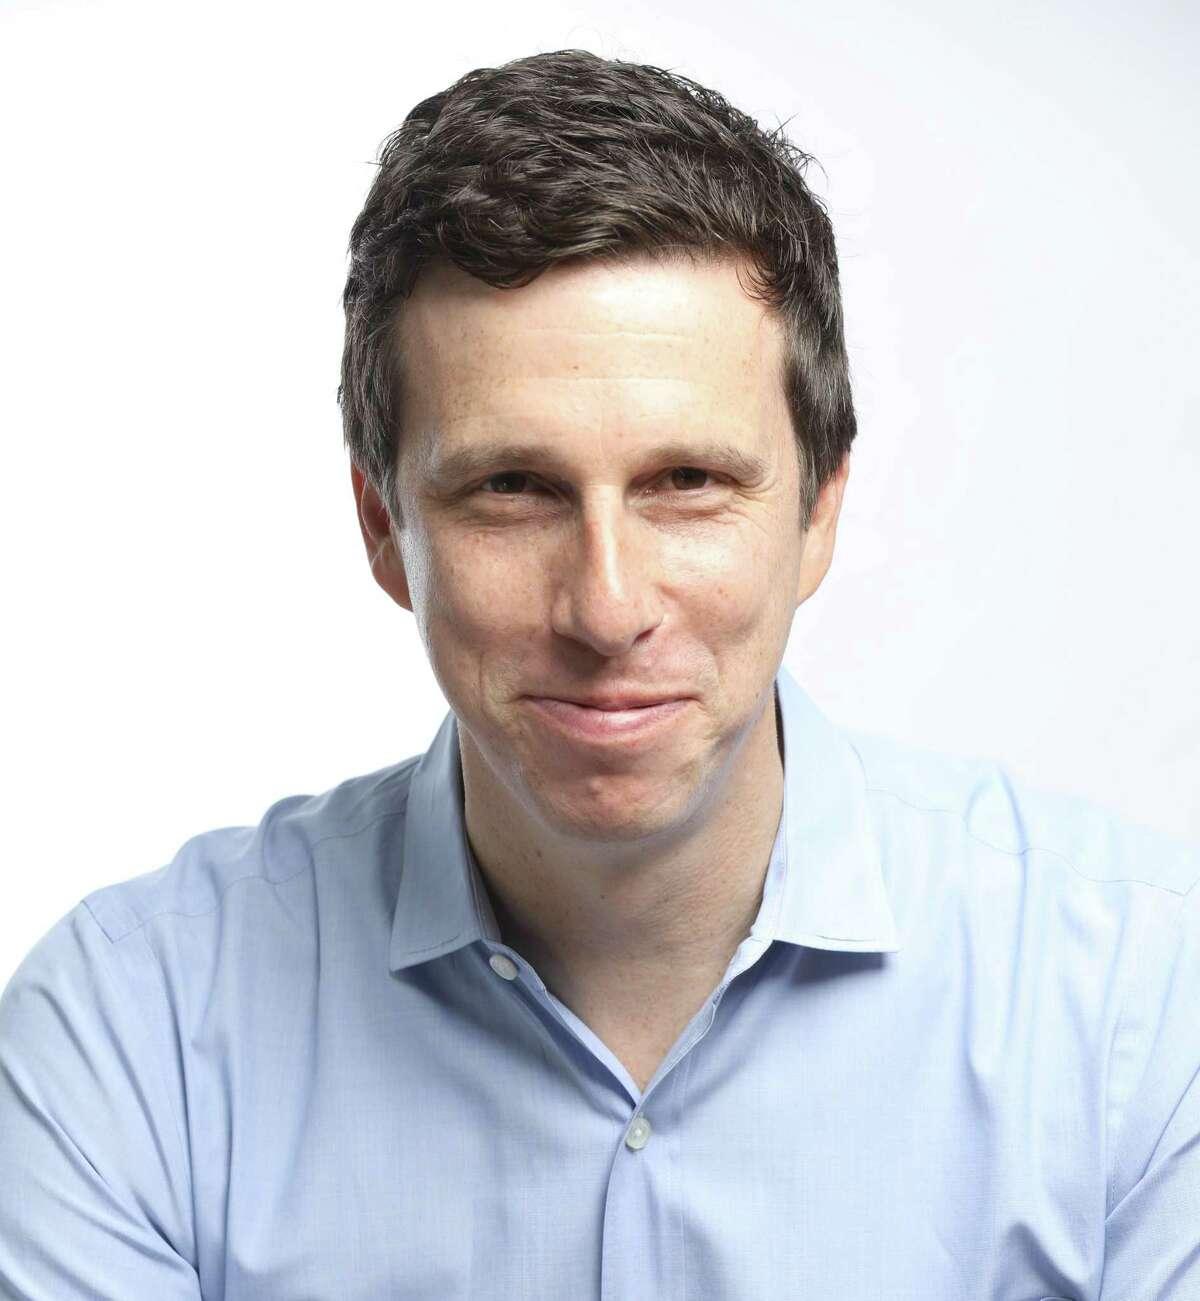 Michael Sachse, Dandelion Energy's CEO.